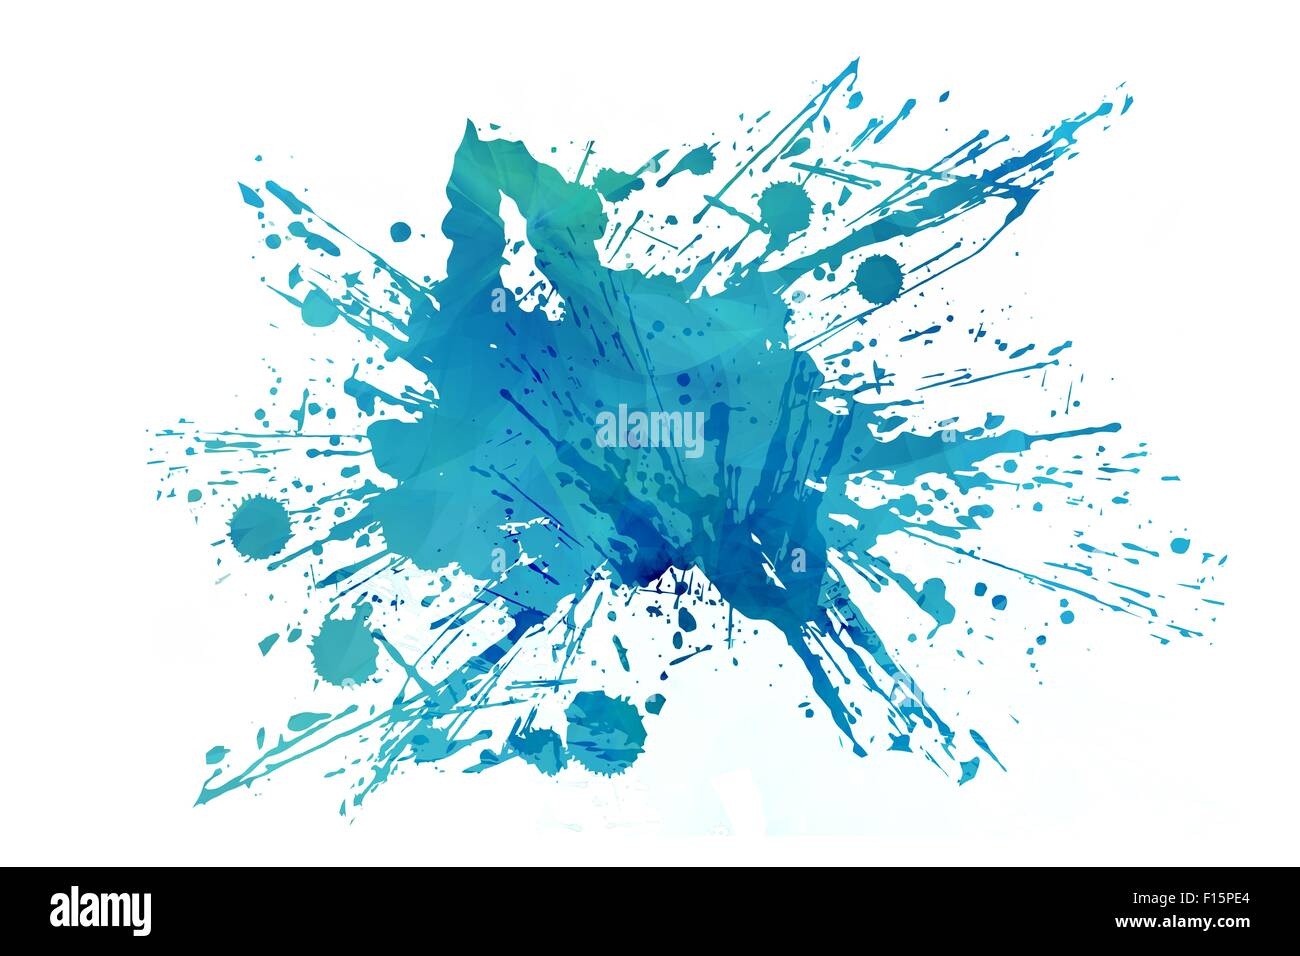 Coole Abstrakte Aqua Splash Isolated On White Background Blauer